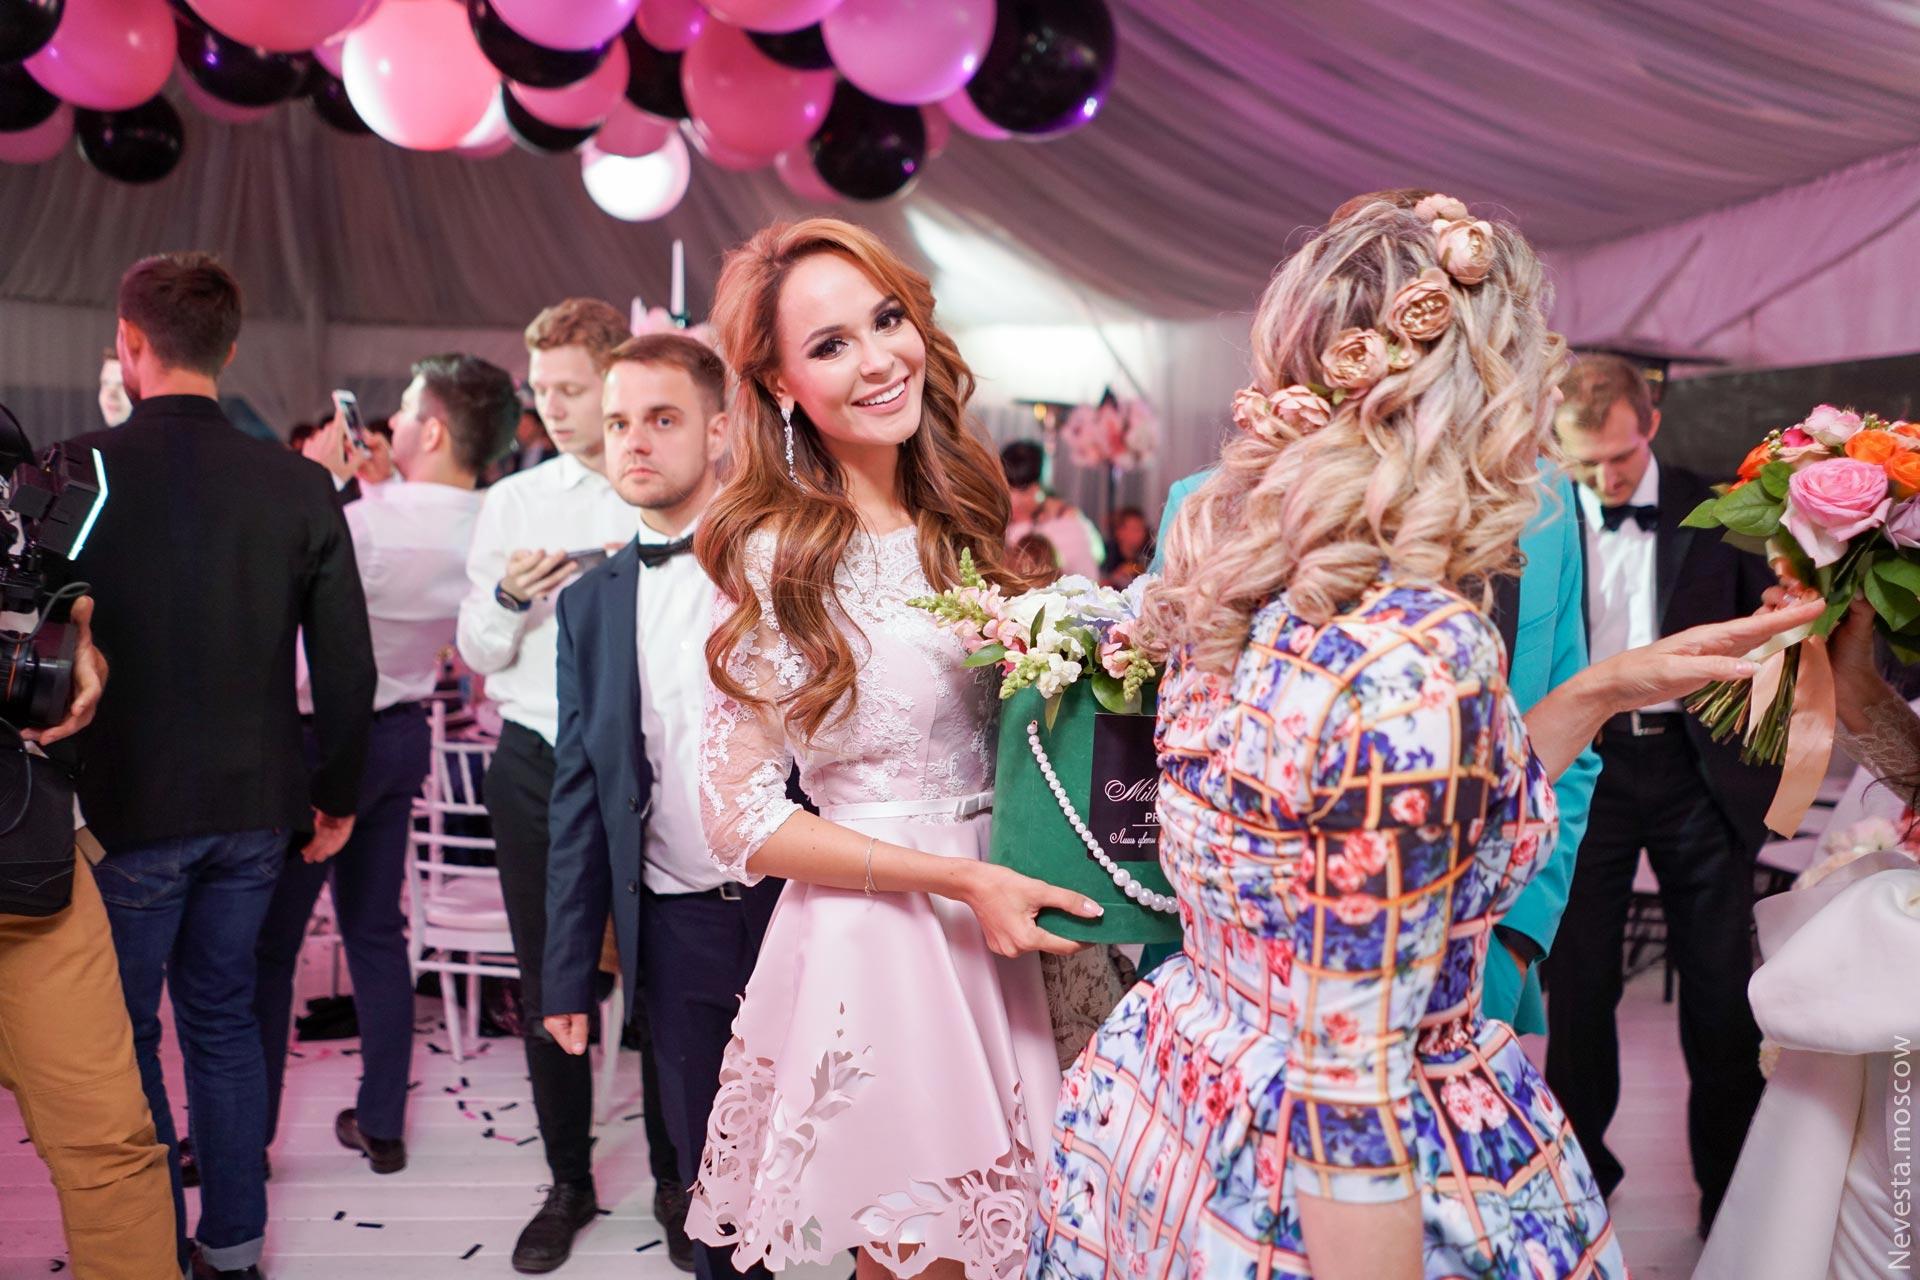 Свадьба Нелли Ермолаевой и Кирилла Андреева фото 38